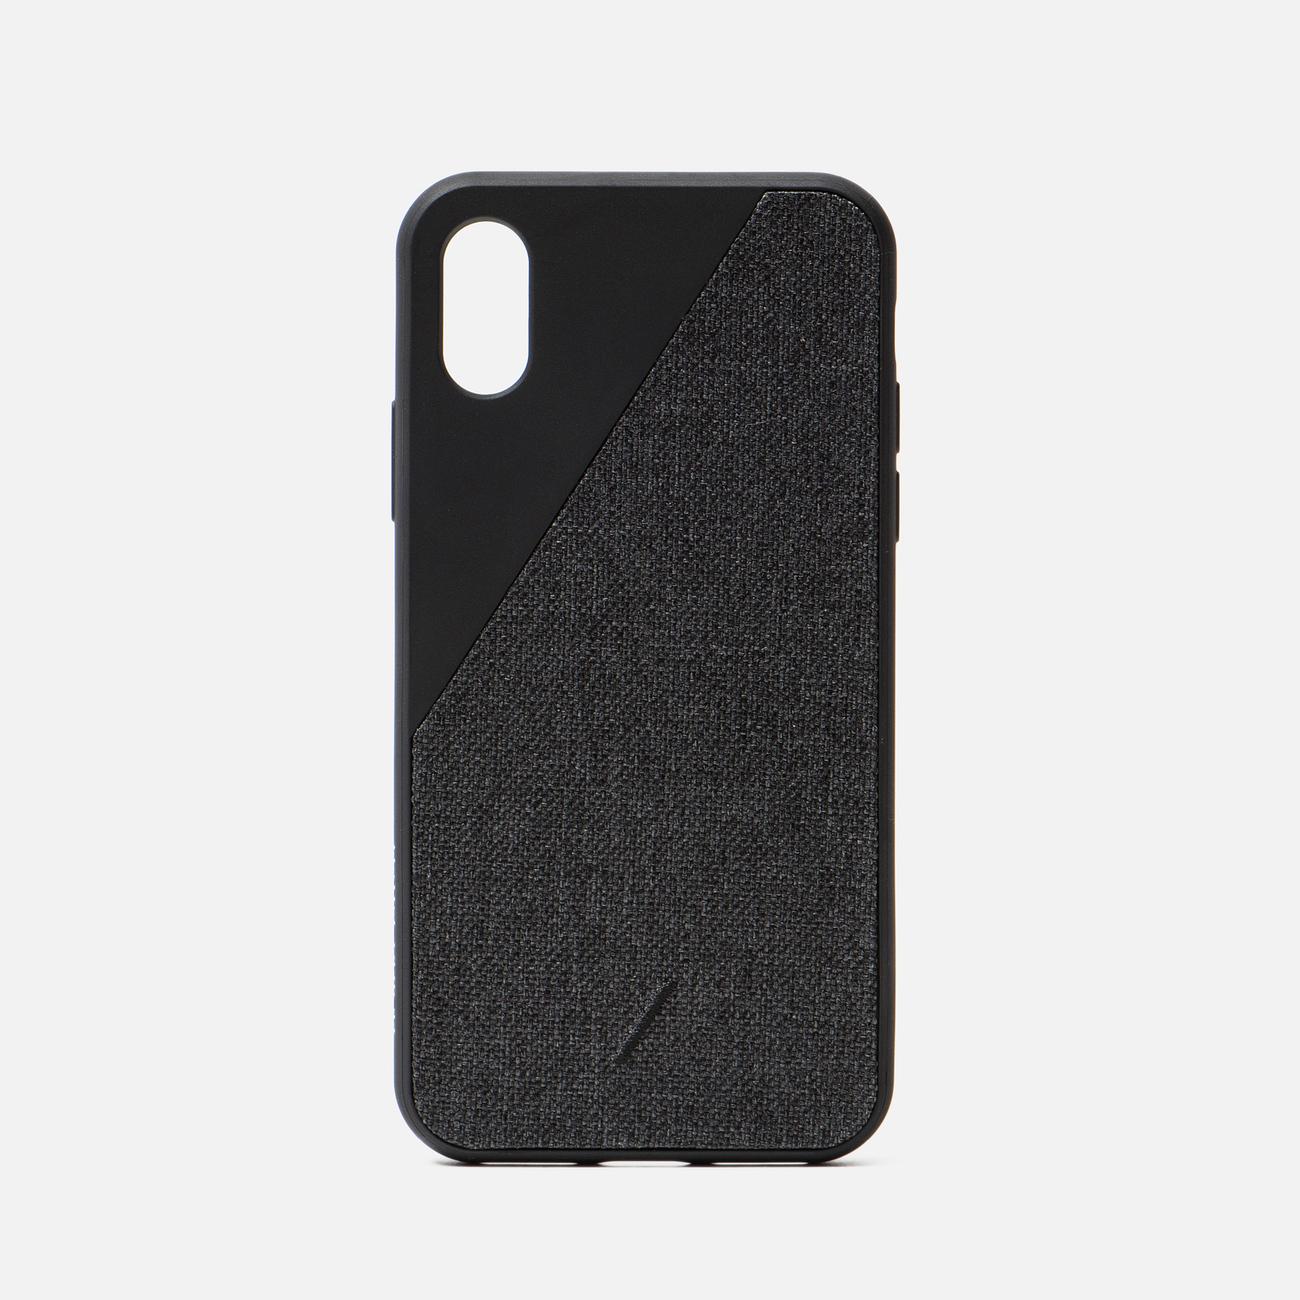 Чехол Native Union Clic Canvas iPhone X/Хs Black